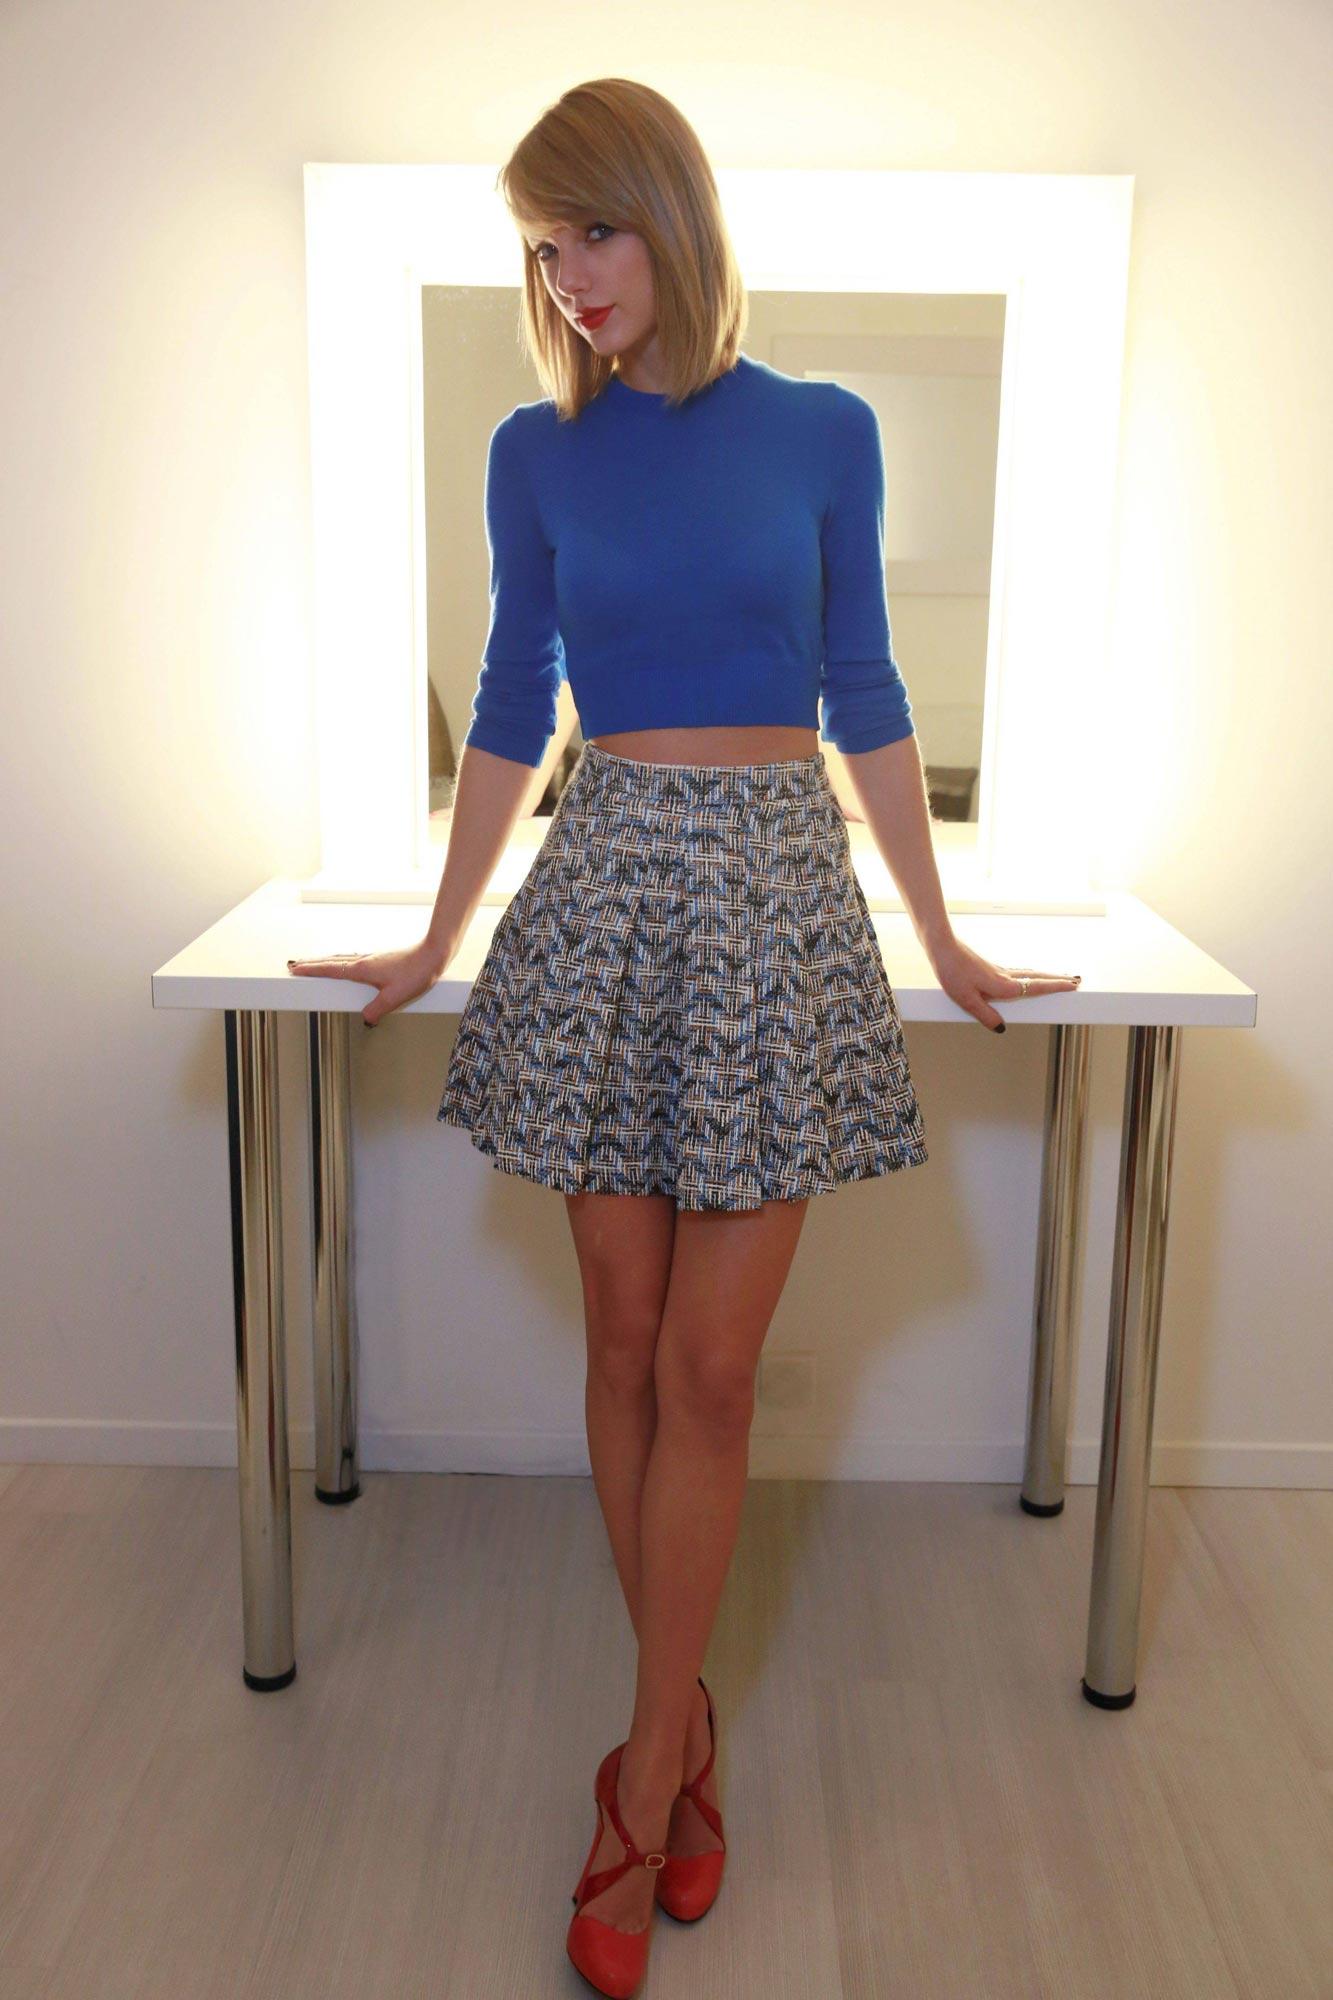 Taylor Swift oc 01